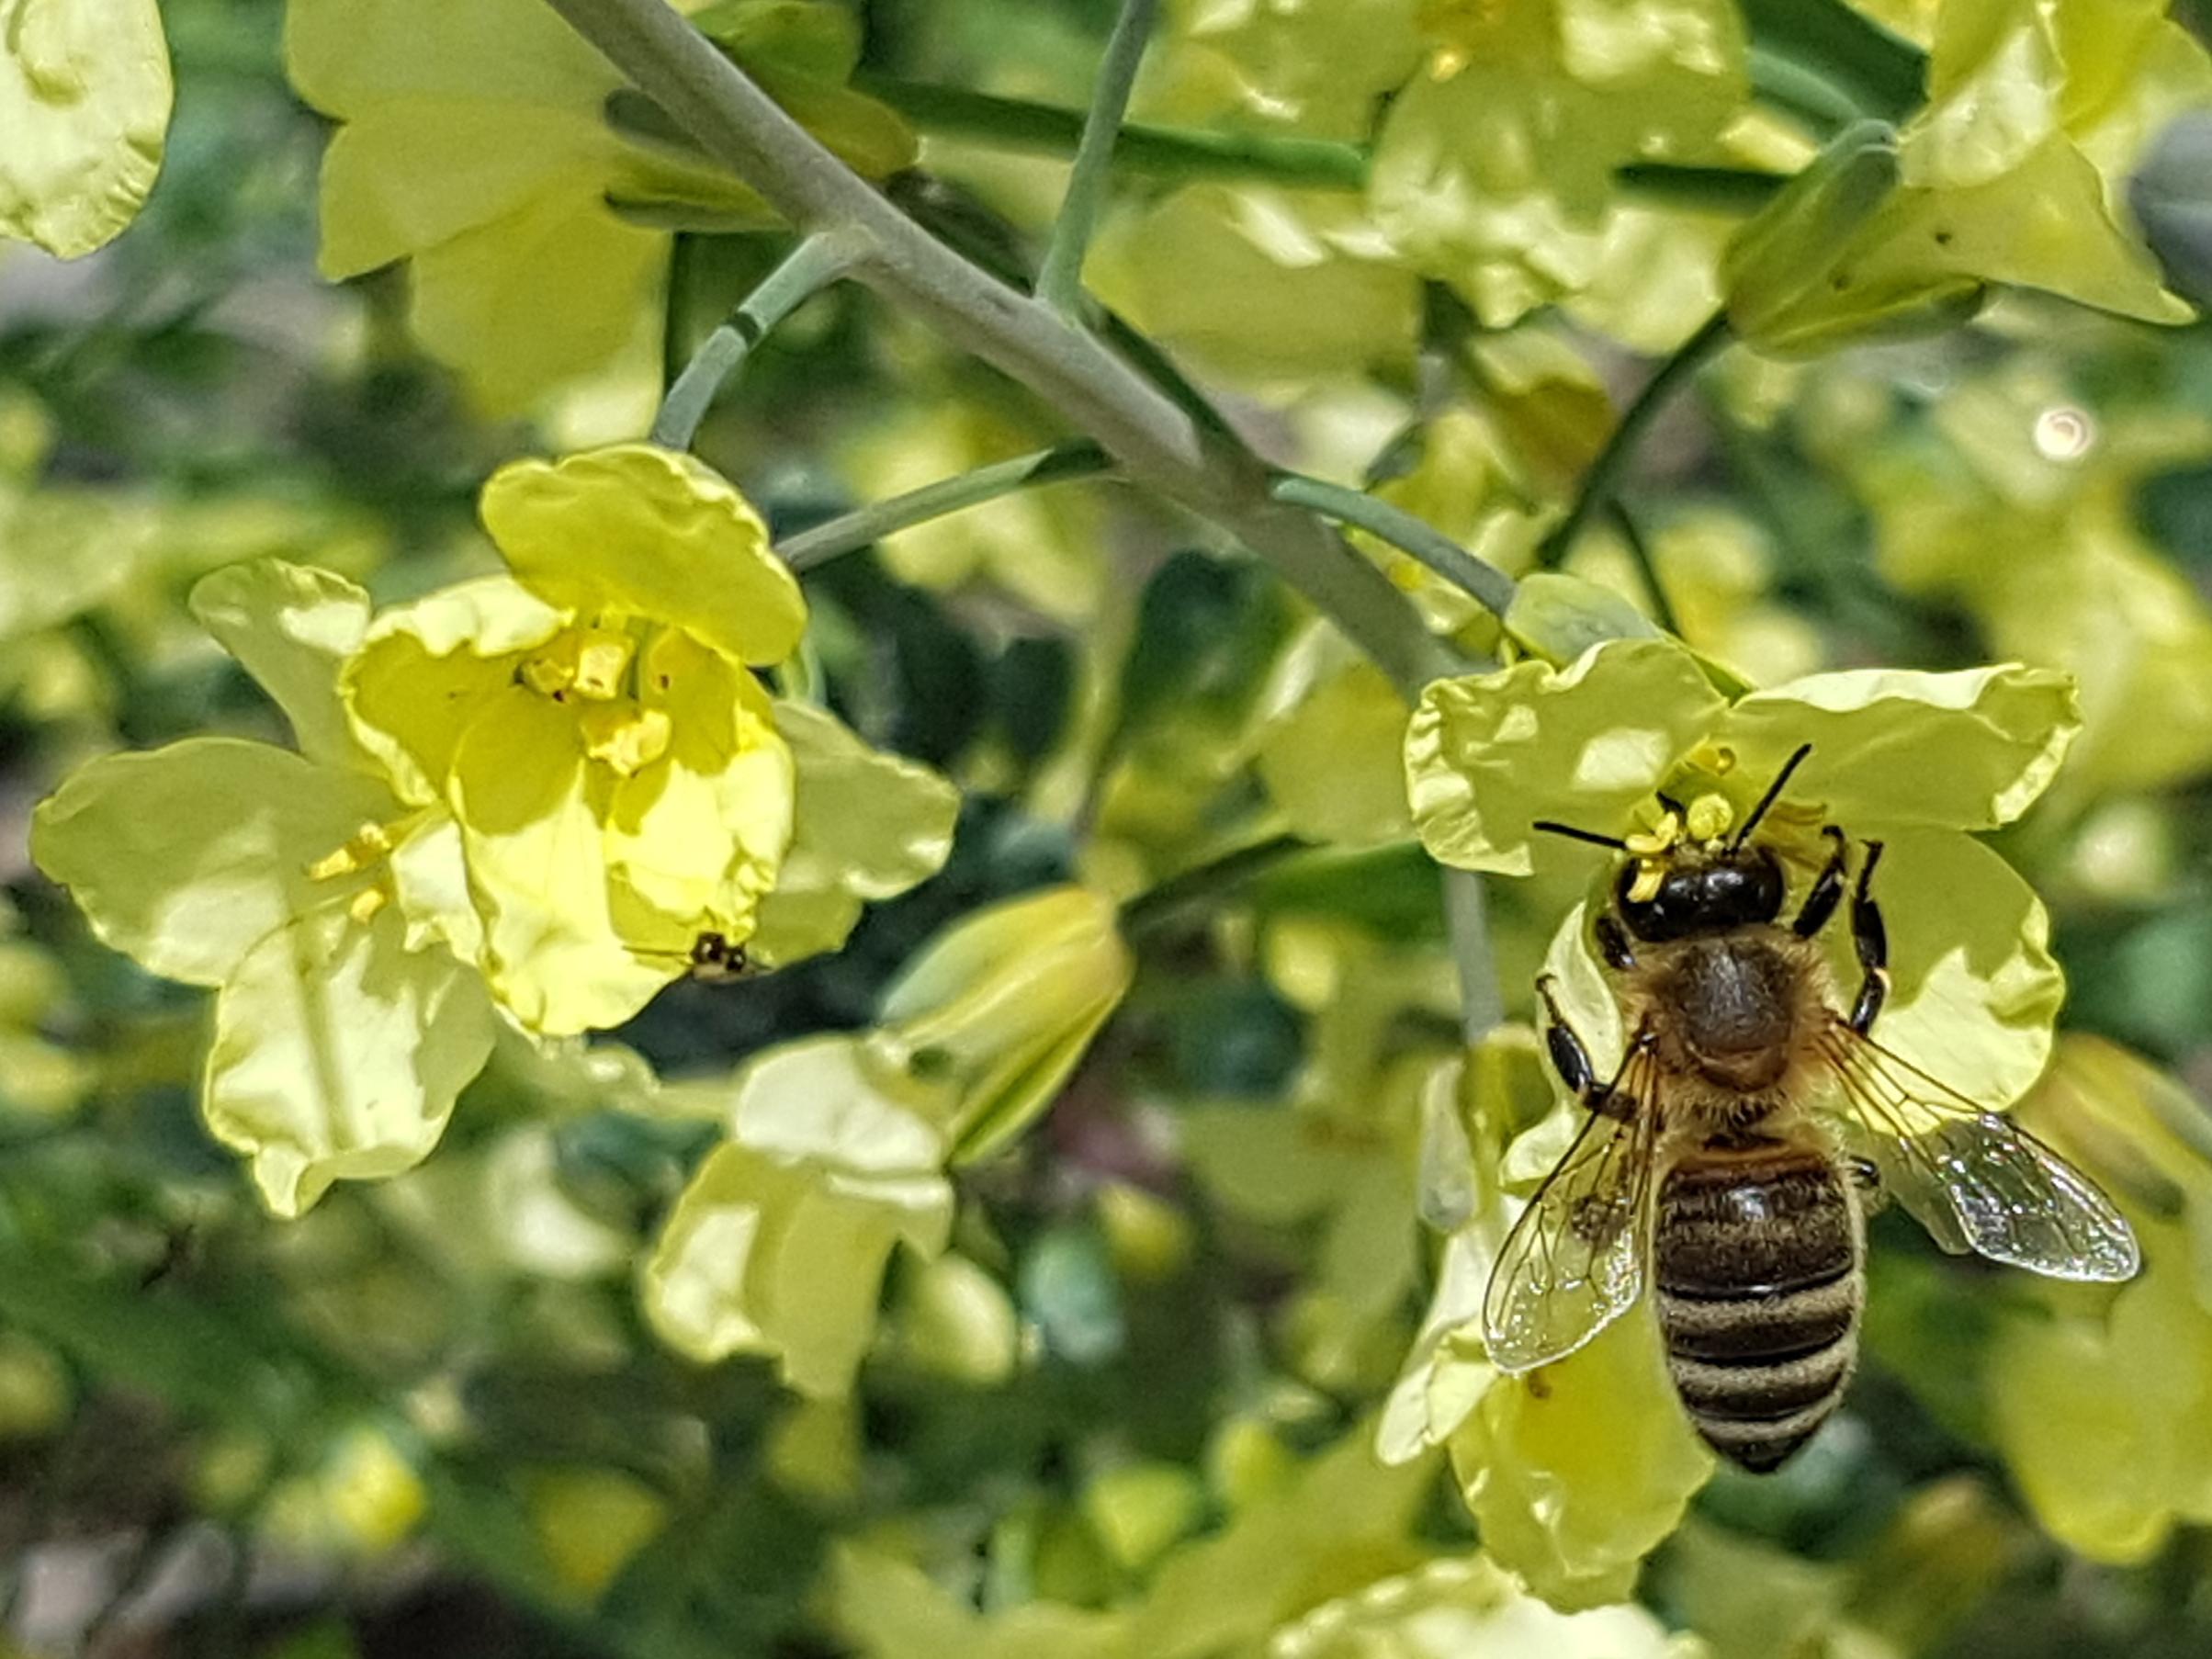 Brokkoli Blüte mit Biene